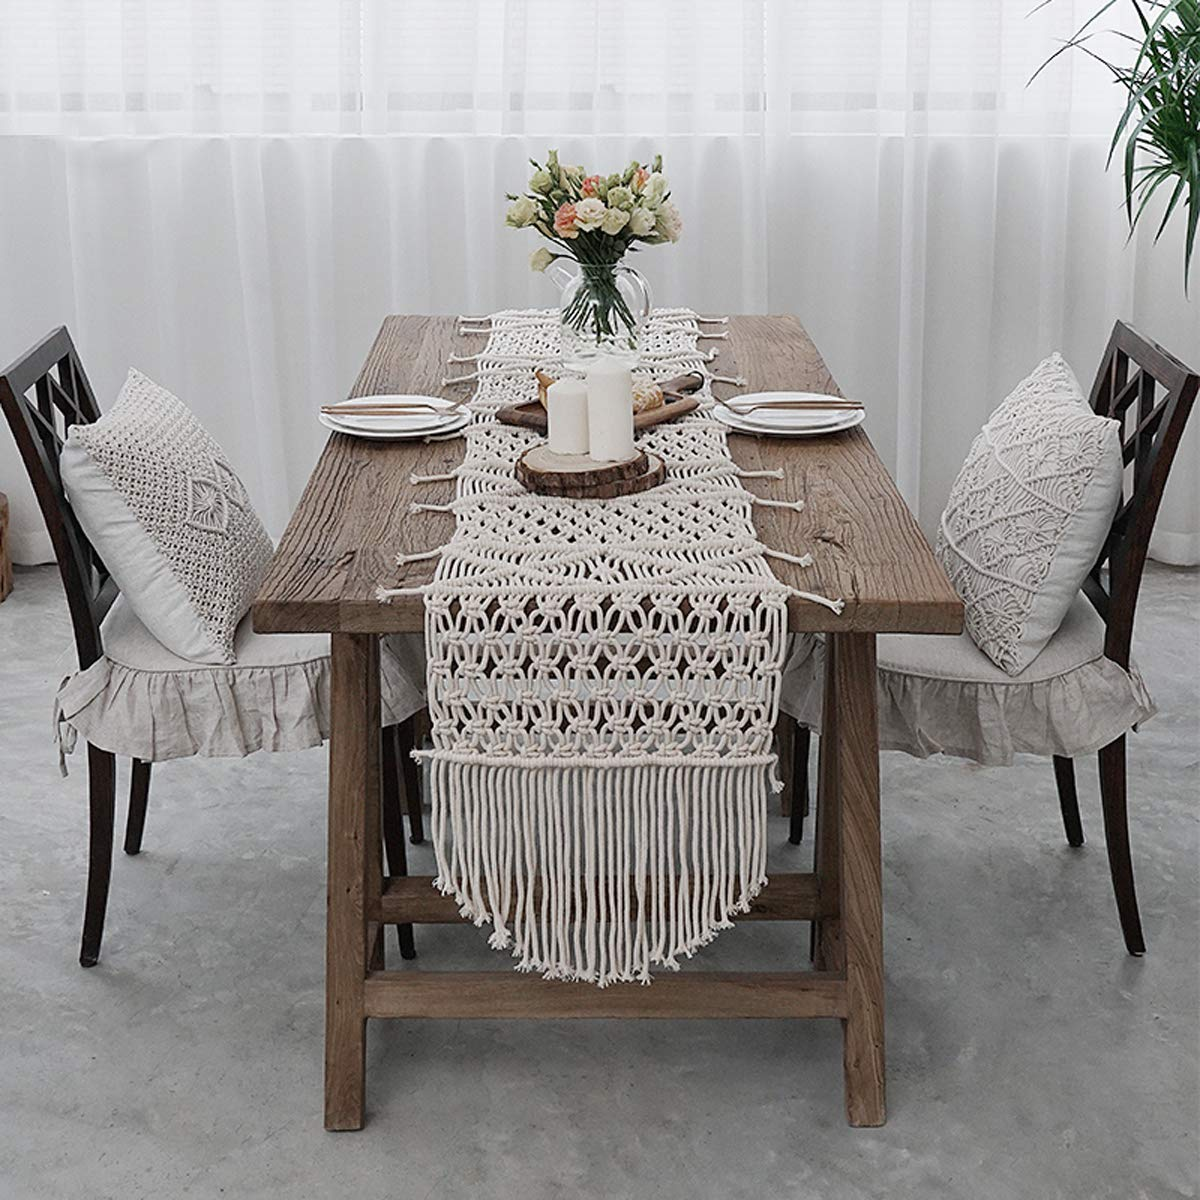 RISEON Bohemia Handmade Natural Macrame Table Runner, macrame table placement, Macrame table Centerpiece, Bed Runner Wedding Home Boho Decor (13.7''W x 102''L)